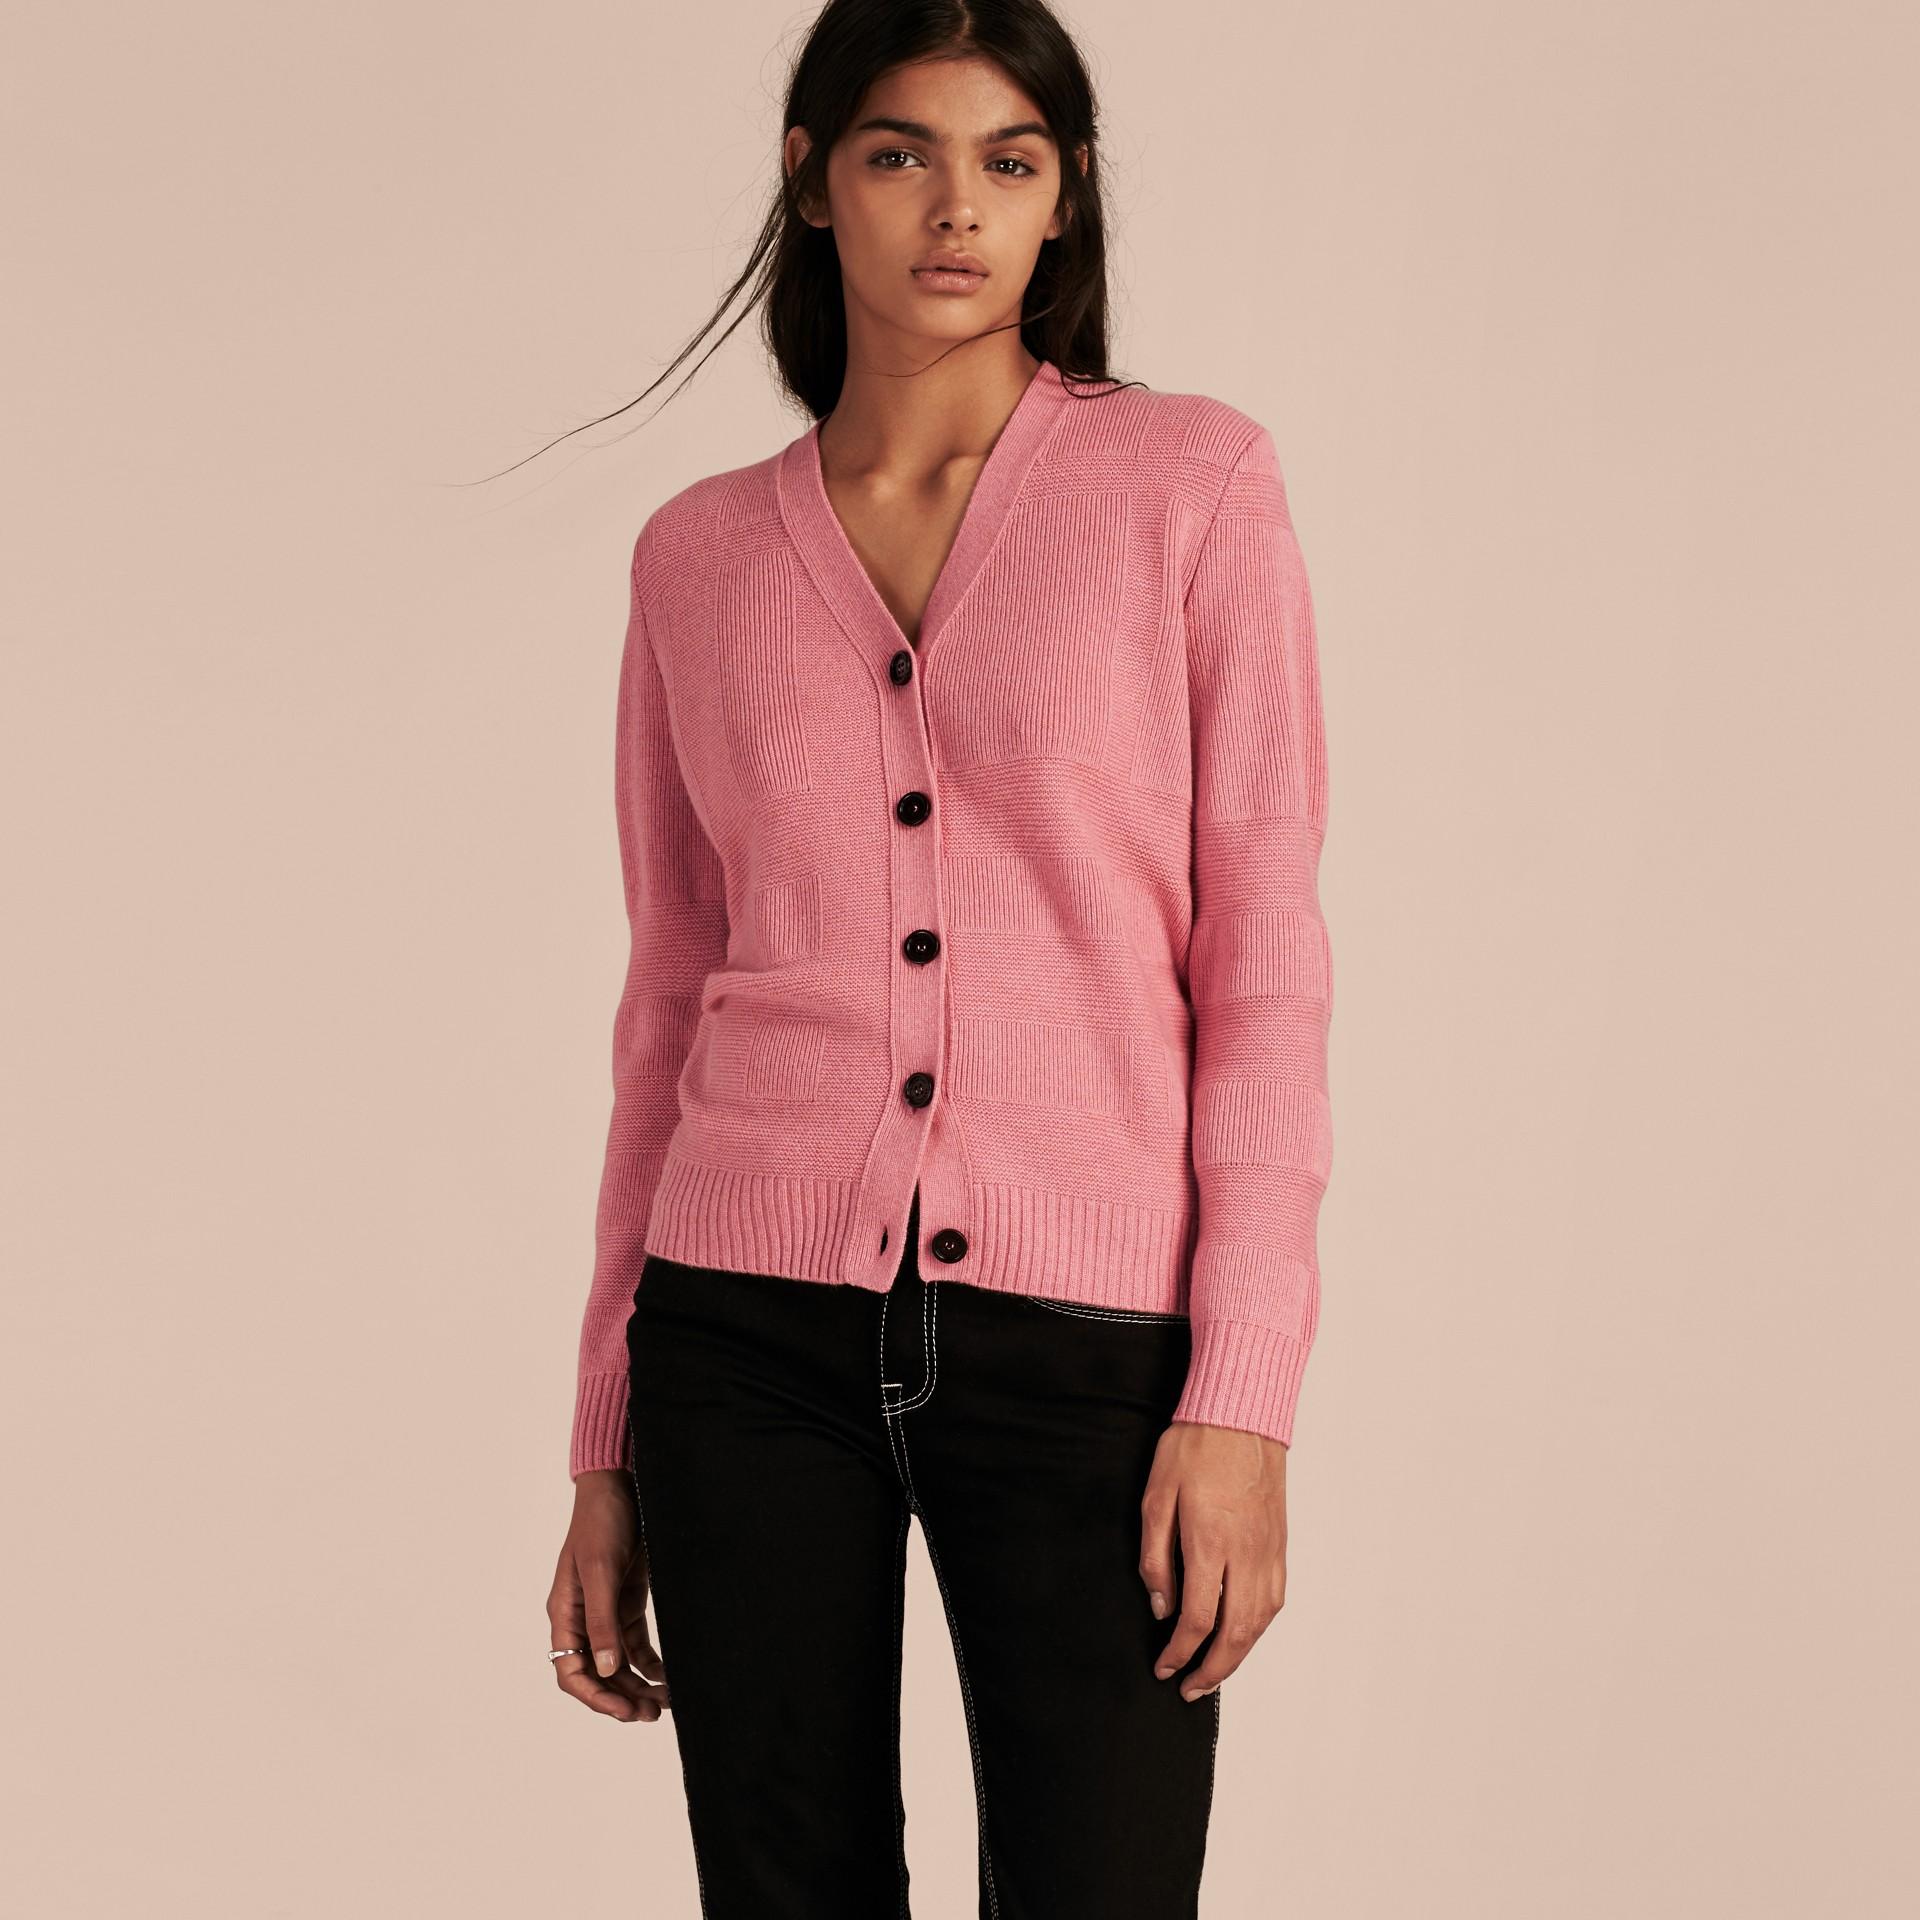 Hydrangea pink melange Check-knit Wool Cashmere Cardigan Hydrangea Pink Melange - gallery image 6